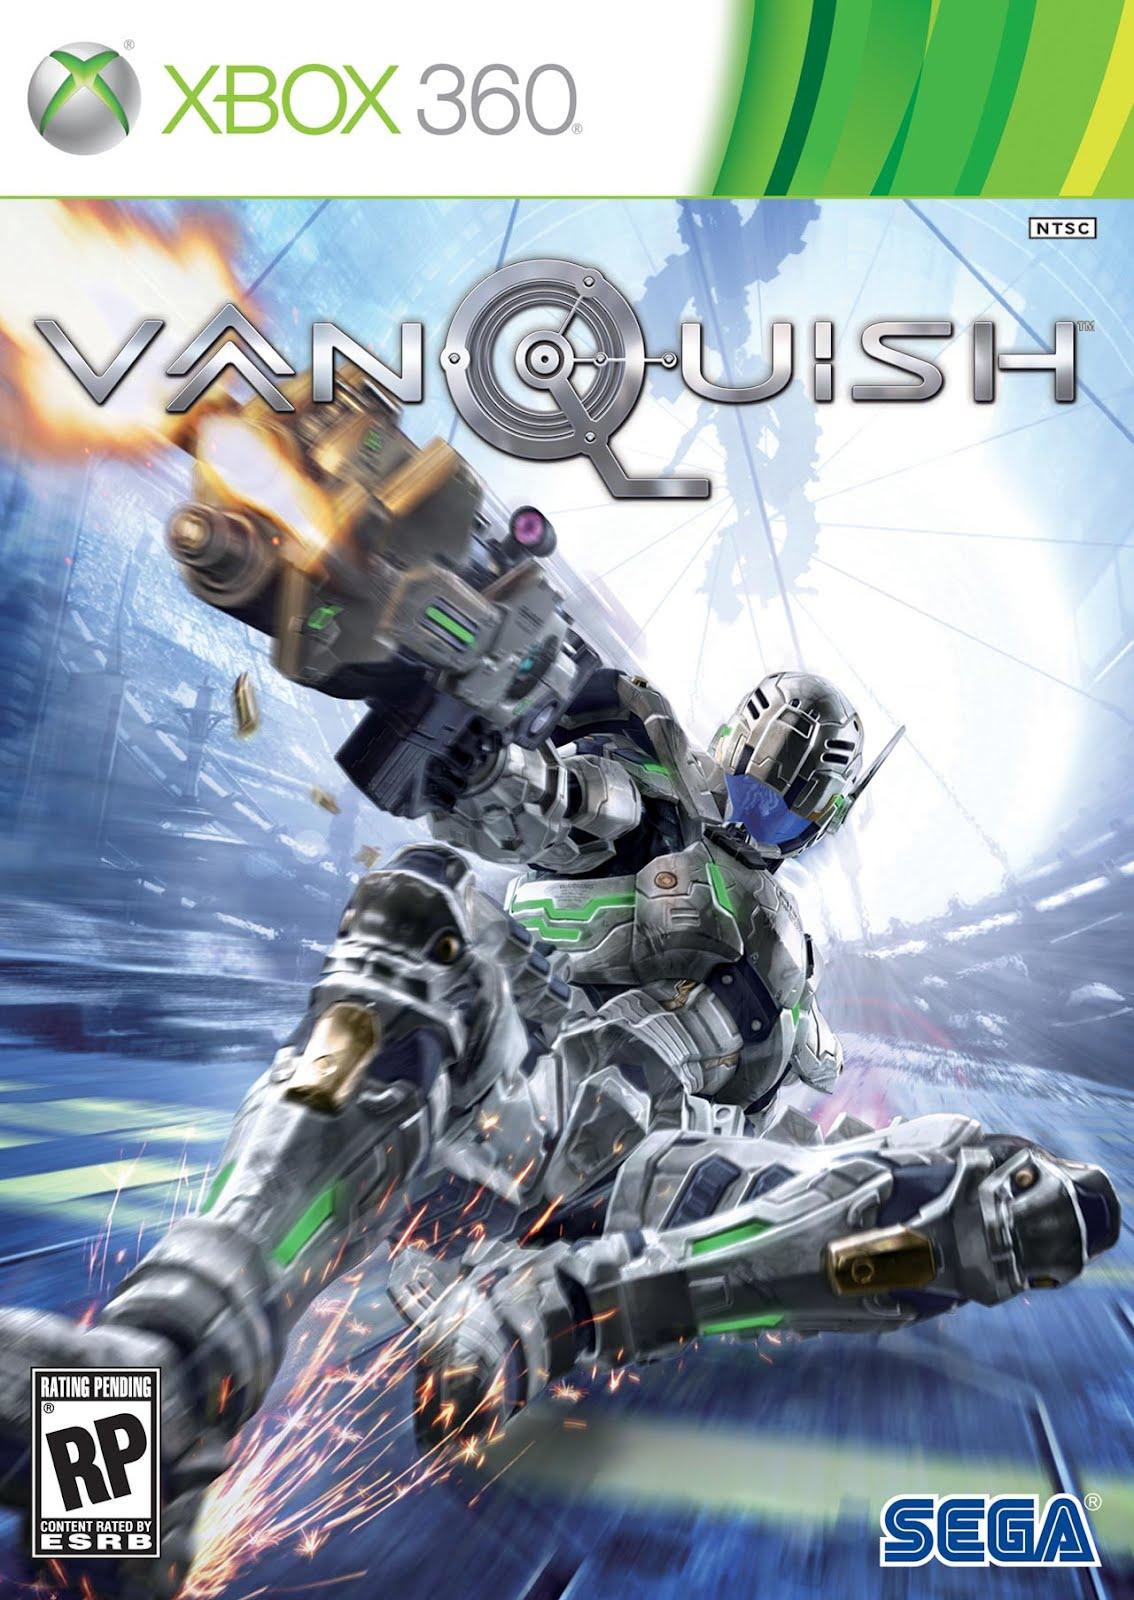 Vanquish-Xbox-360-Box-Cover-1280px-50p.jpg